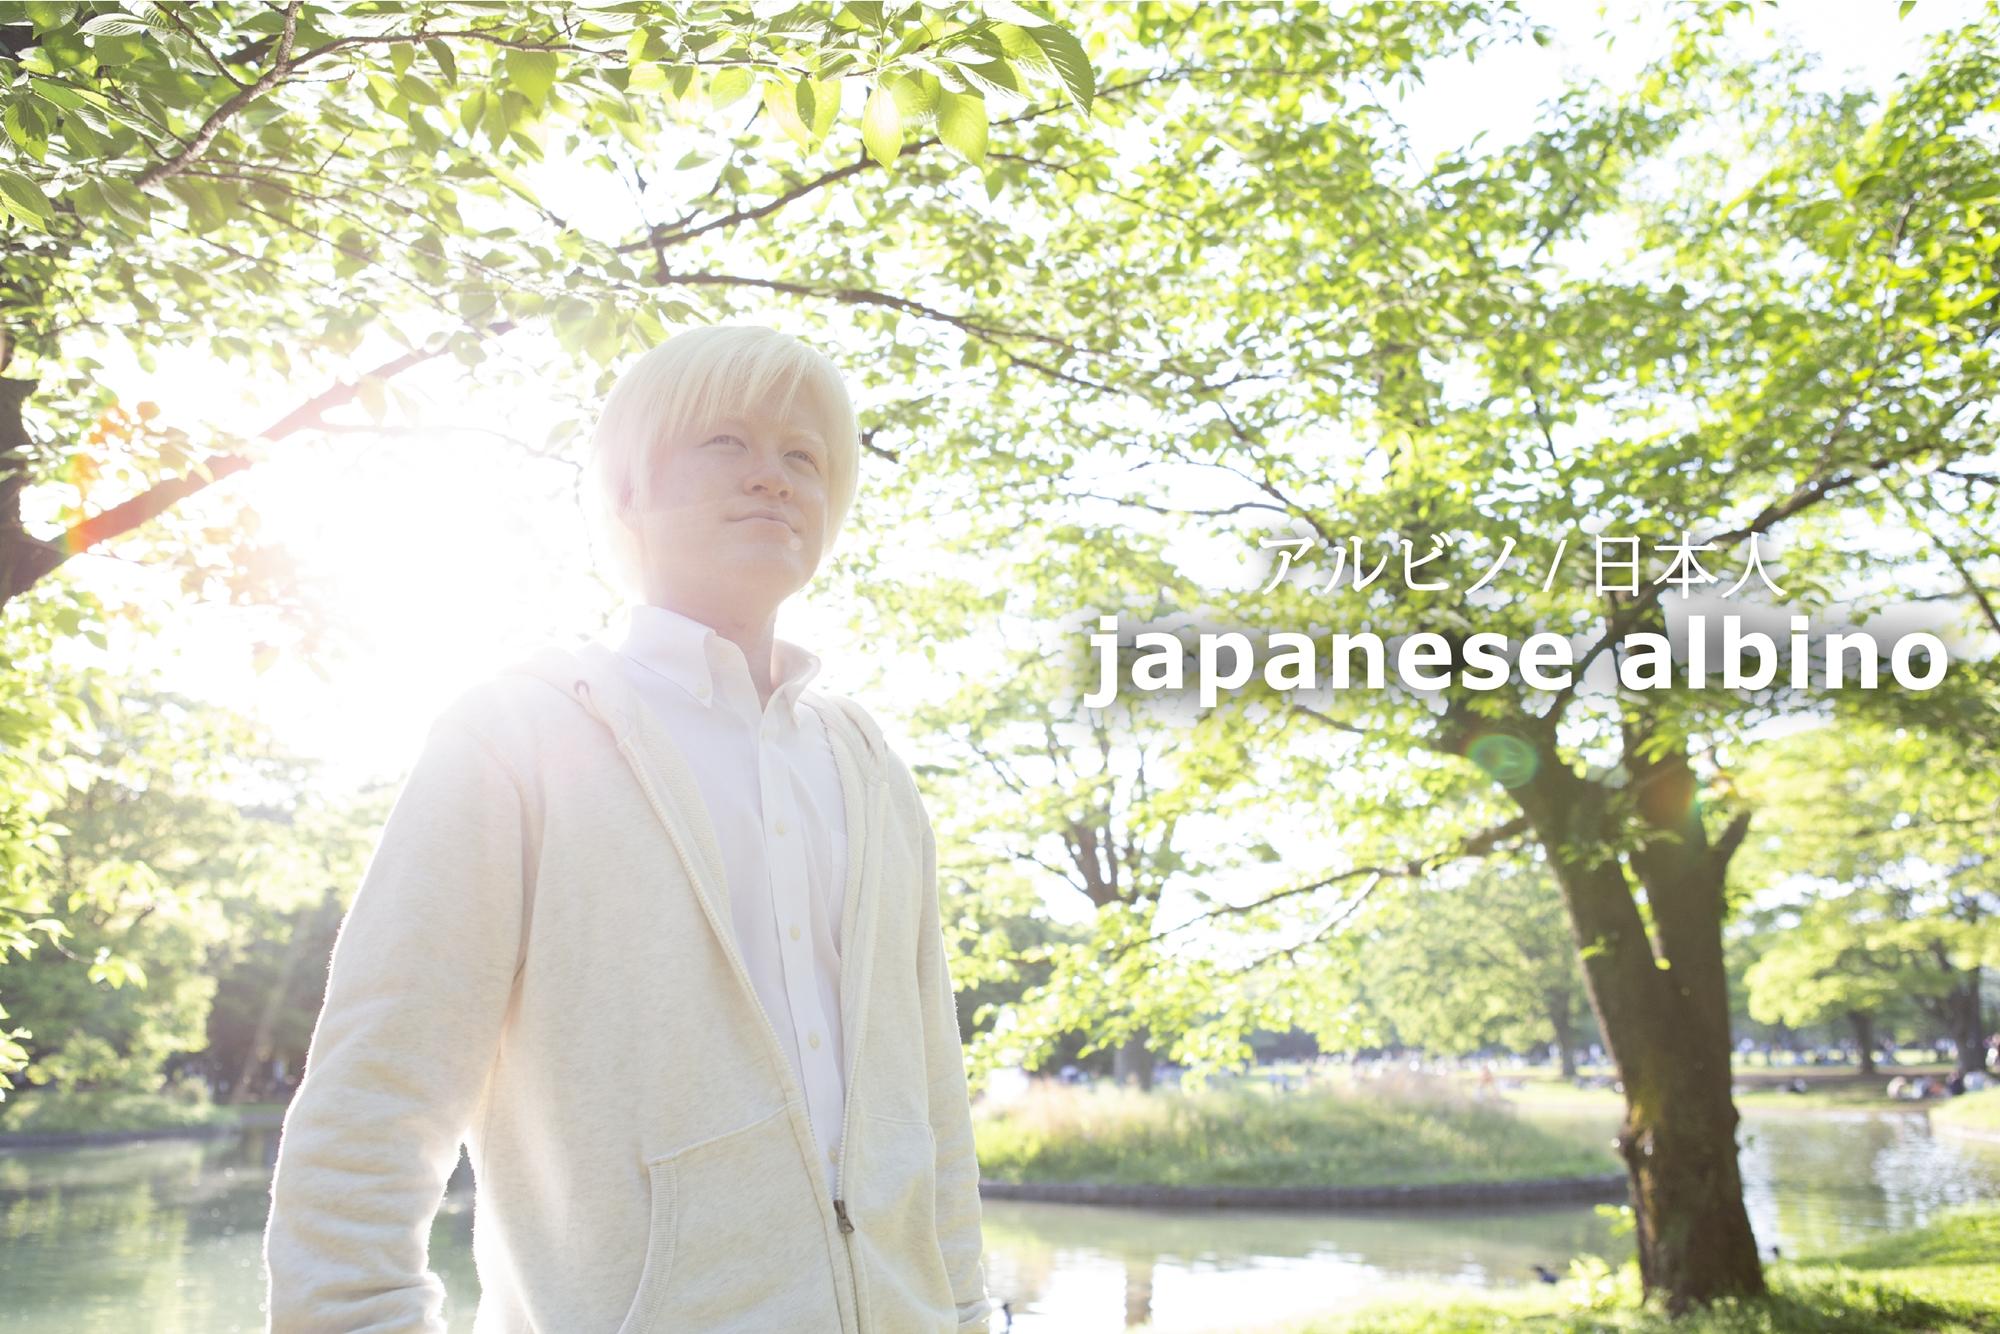 Japanese Albino 日本人のアルビノ